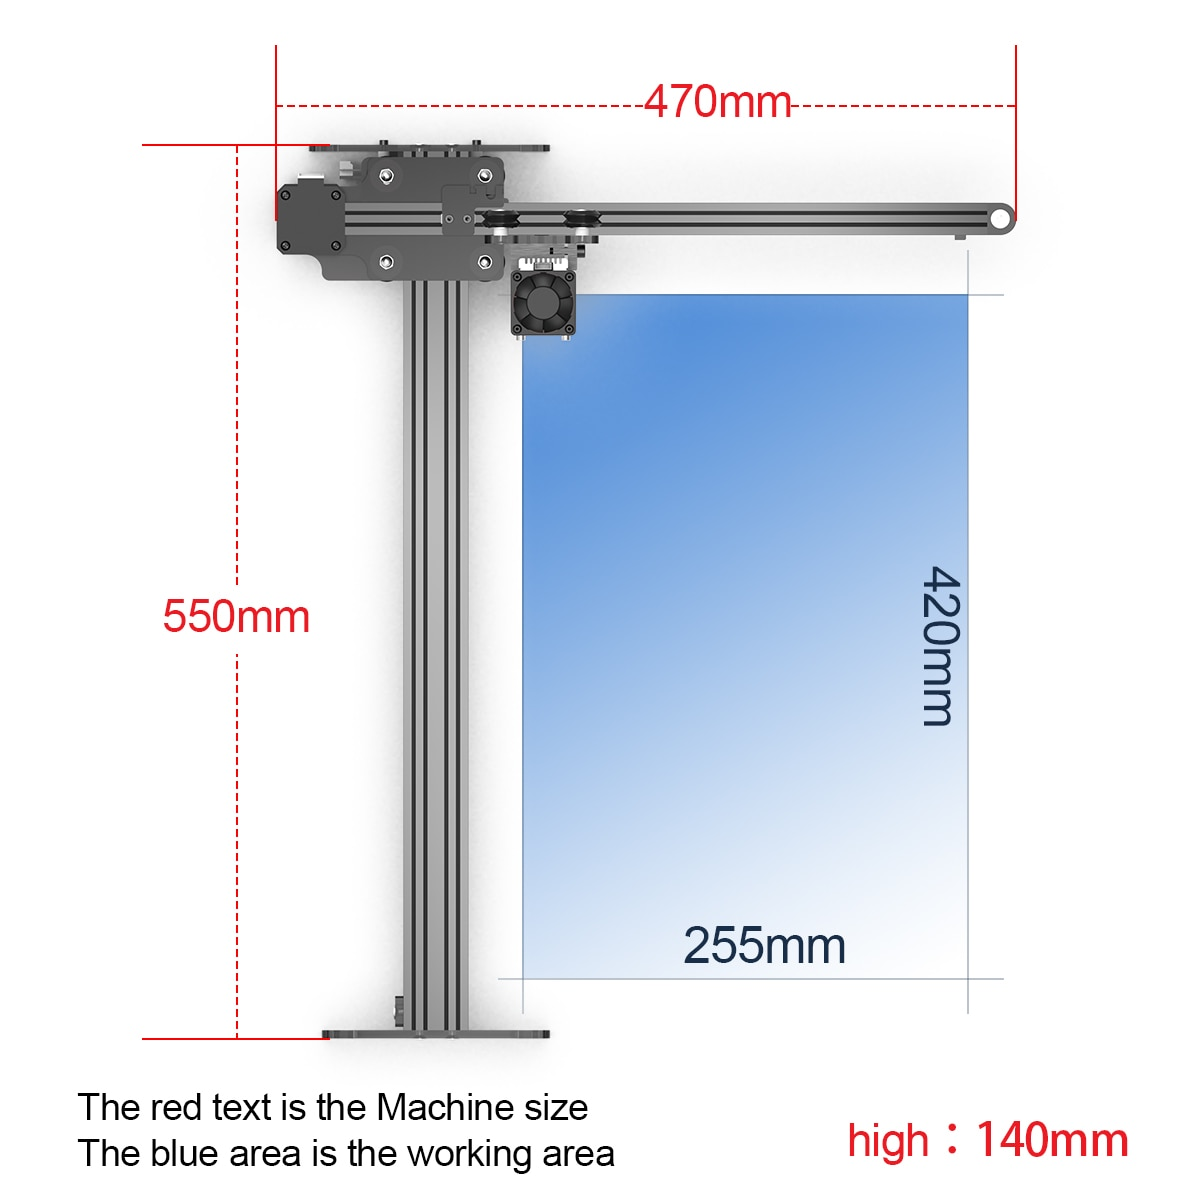 NEJE Master 2S Plus Engraving Machine Laser Cutter CNC Laser Tool Laser Printer With Lightburn Wirless Control DIY Wood Cutting enlarge